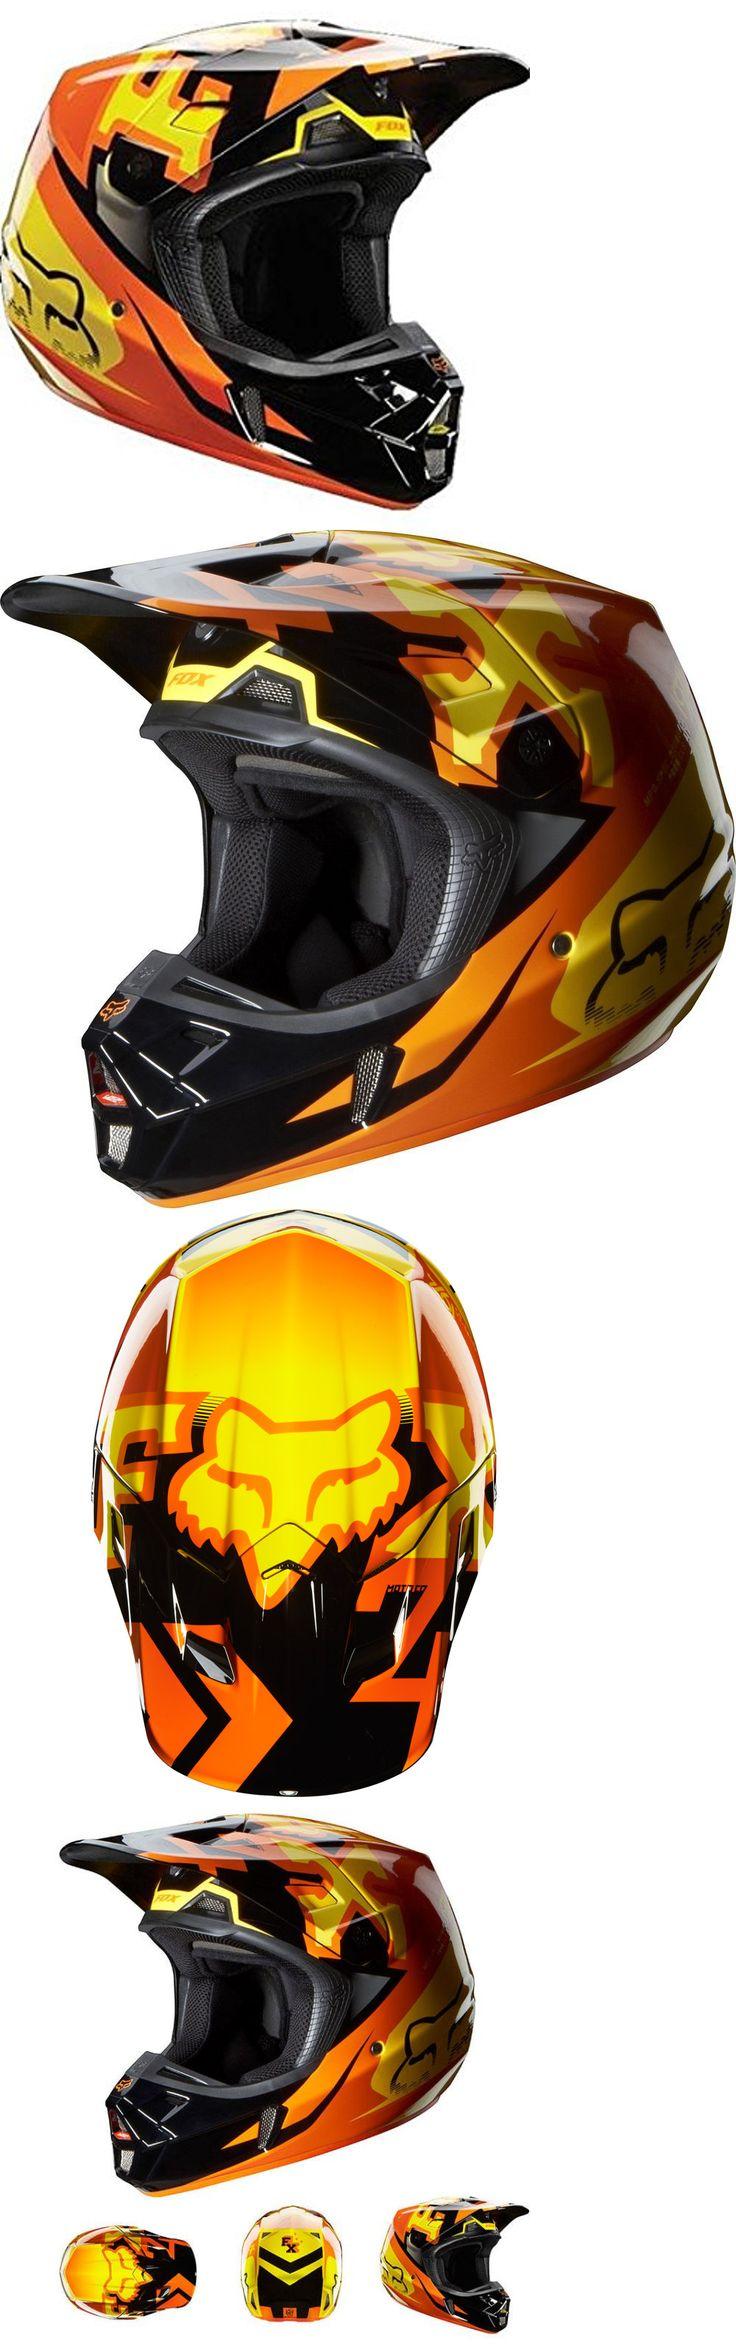 Helmet Accessories 177865: New Fox Racing Anthem Mens V2 Motocross Motorcycle Helmet Orange Size Xs -> BUY IT NOW ONLY: $179.99 on eBay!